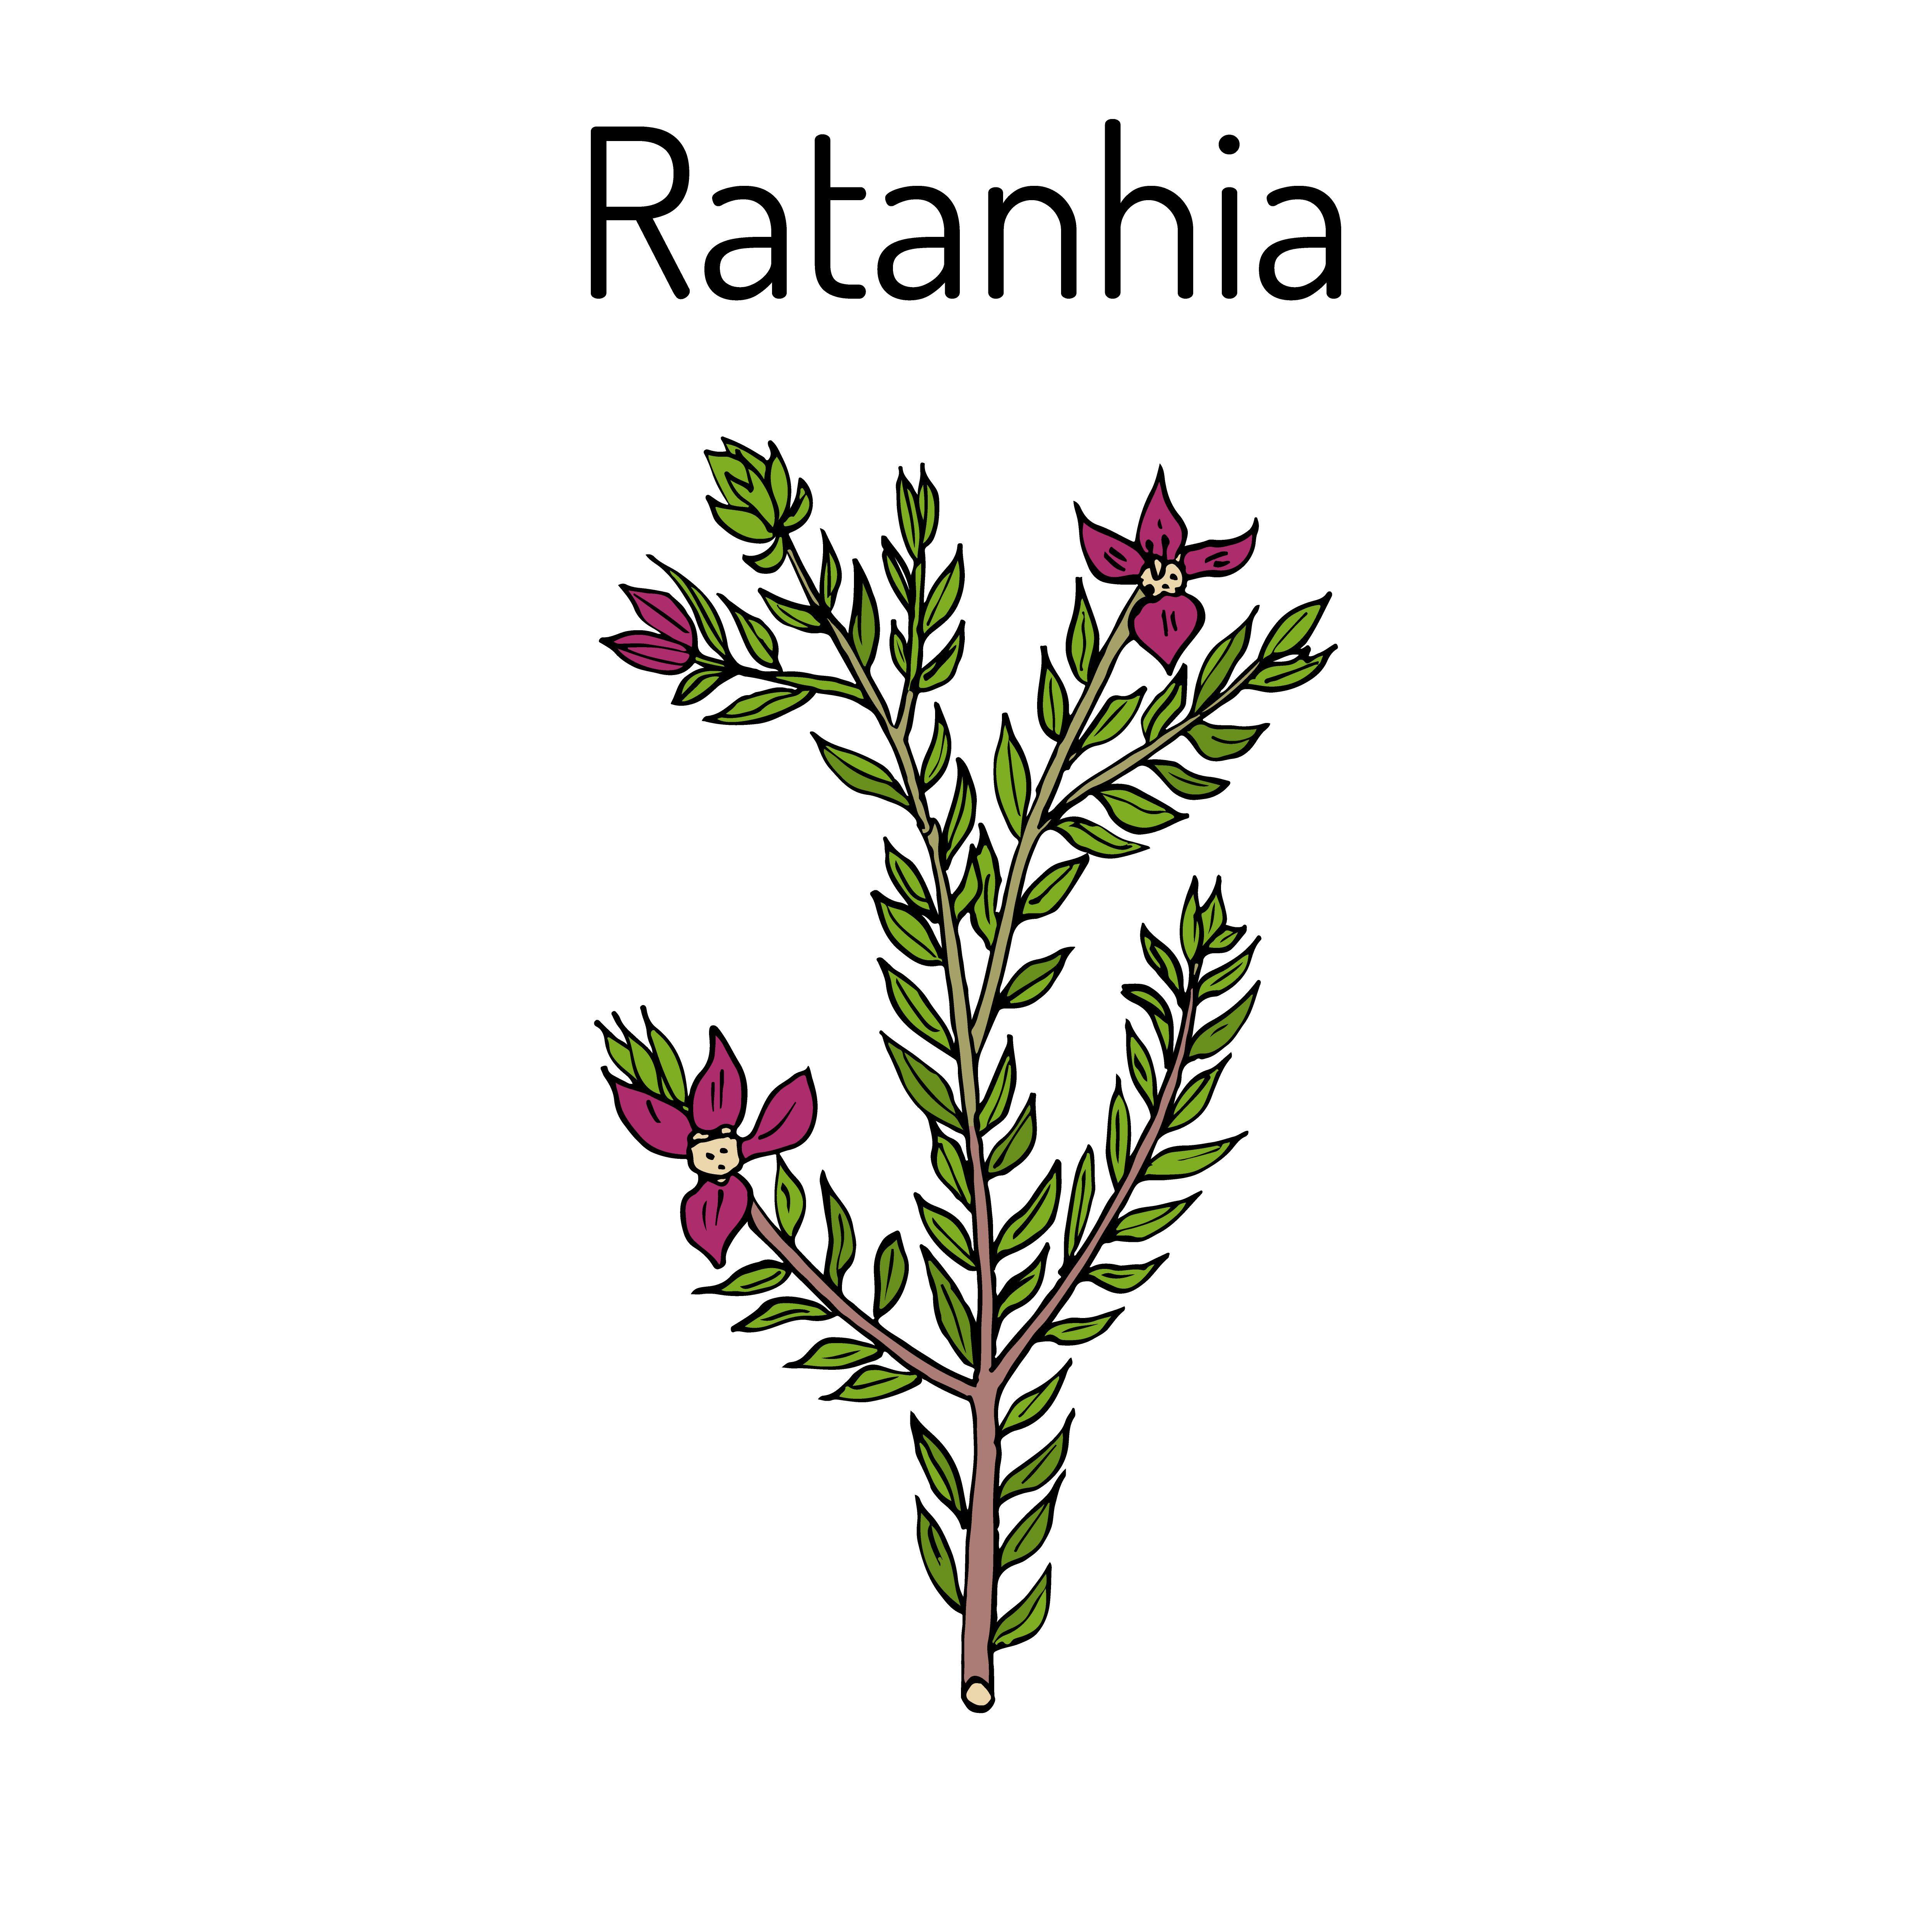 Ratanhia Pflanzenteile Hausmittel Pflanzen